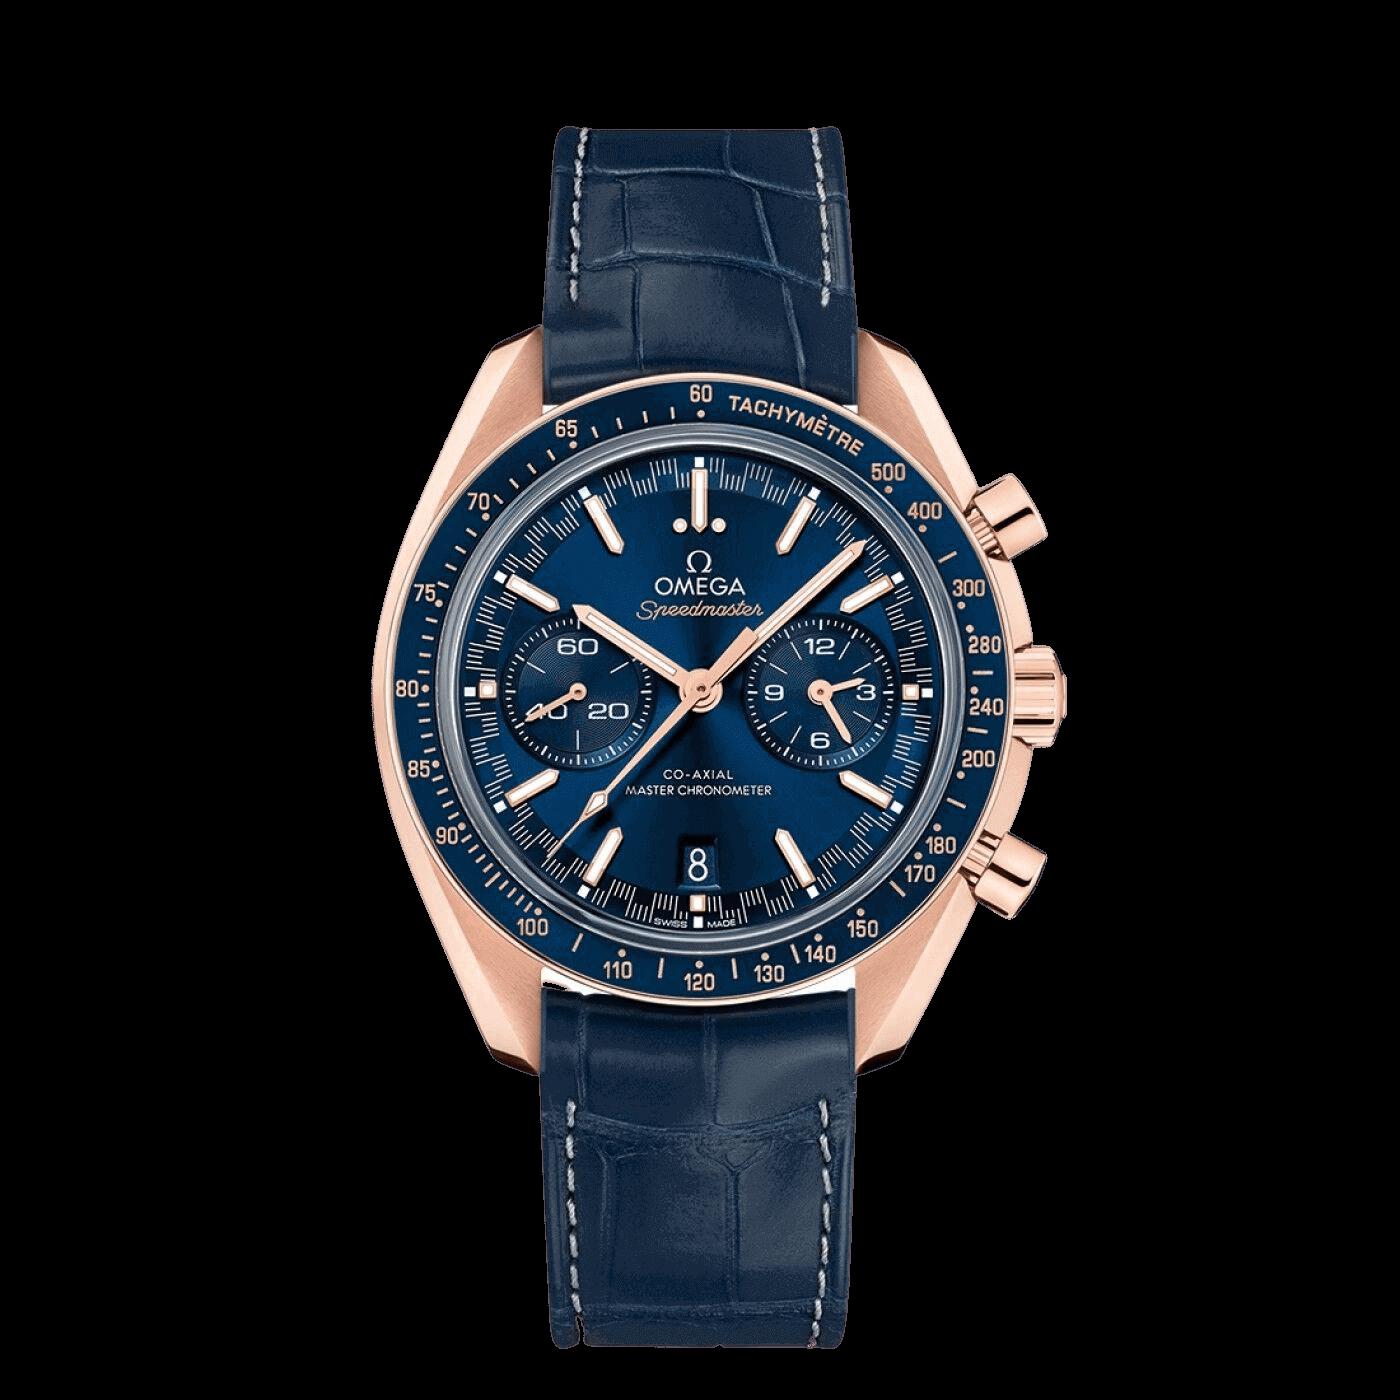 omega speedmaster rose gold watches